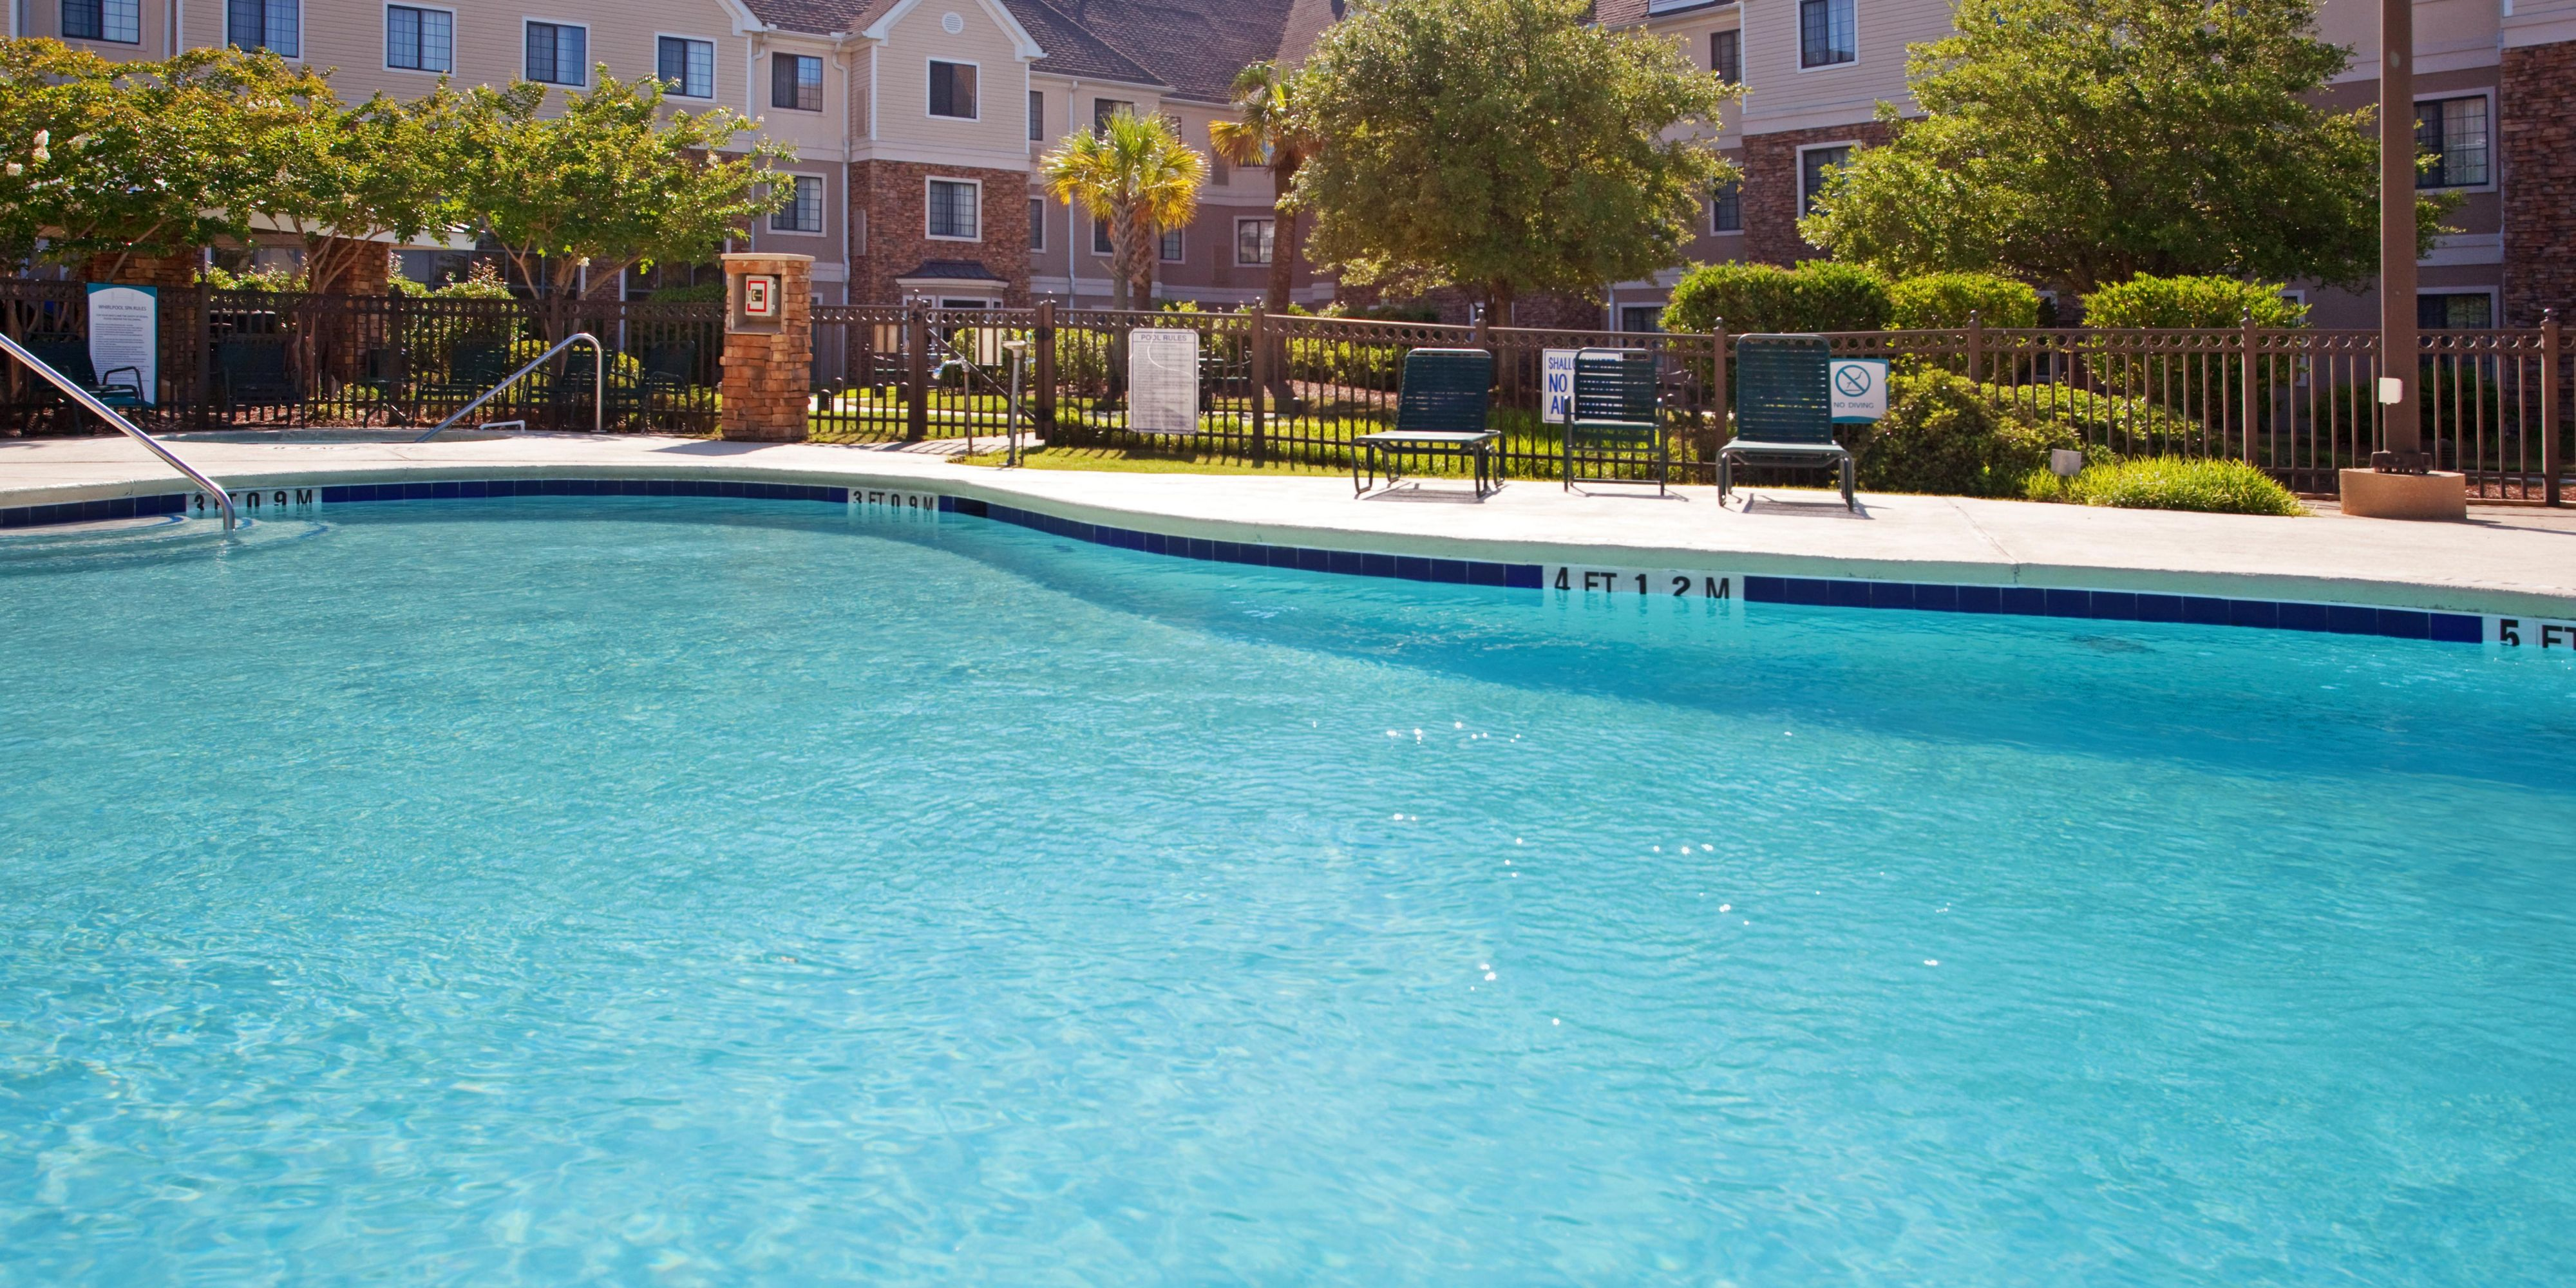 Staybridge Suites Myrtle Beach - West